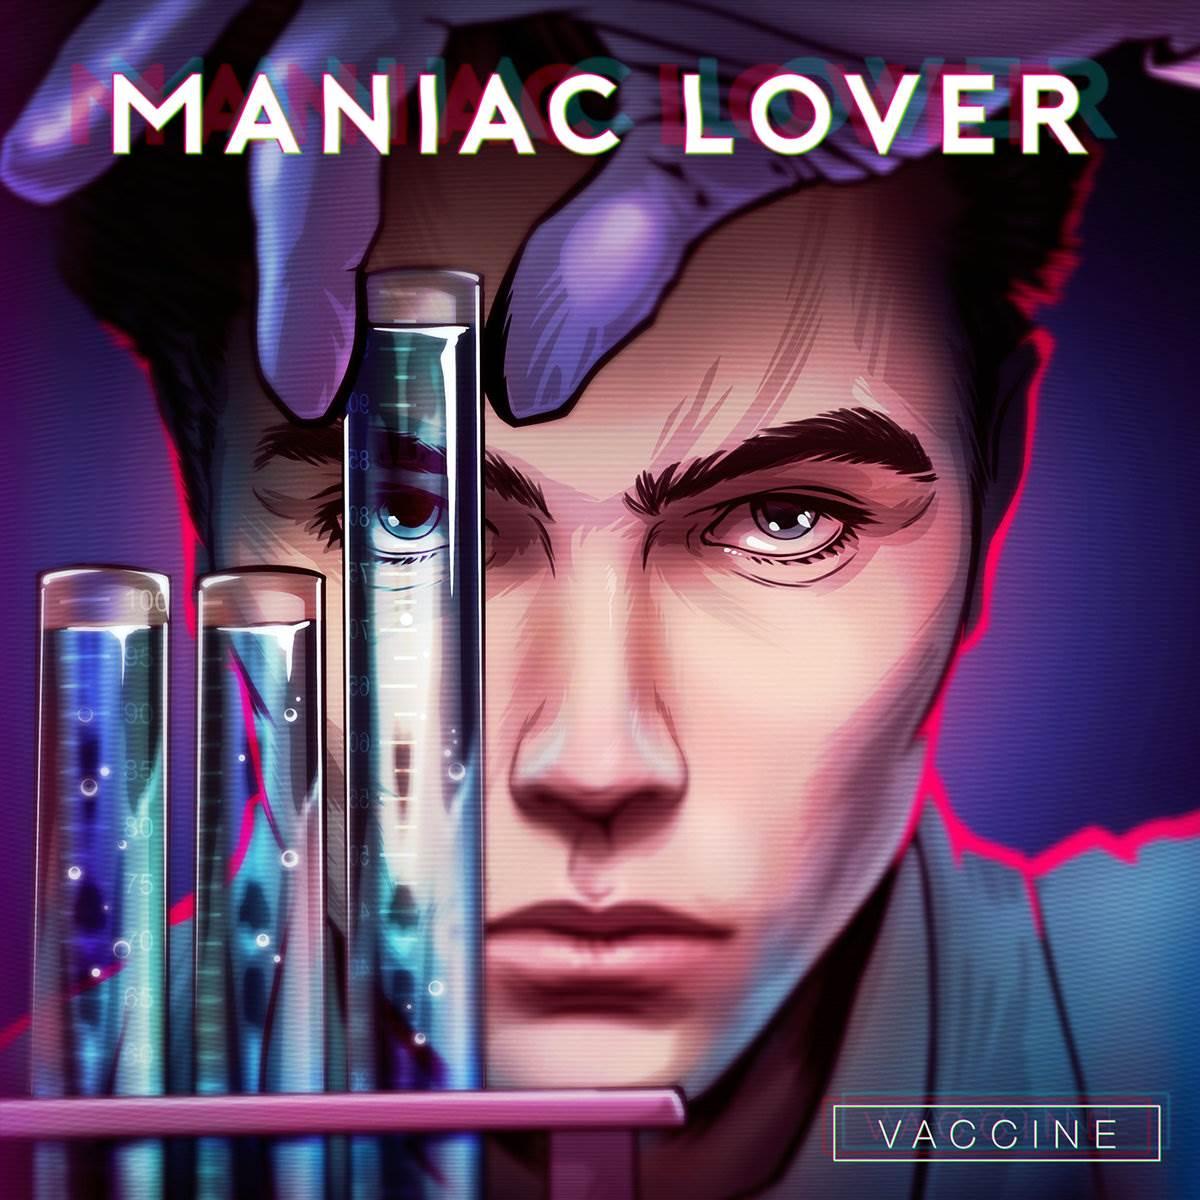 a0491895912 10 - Maniac Lover - Vaccine